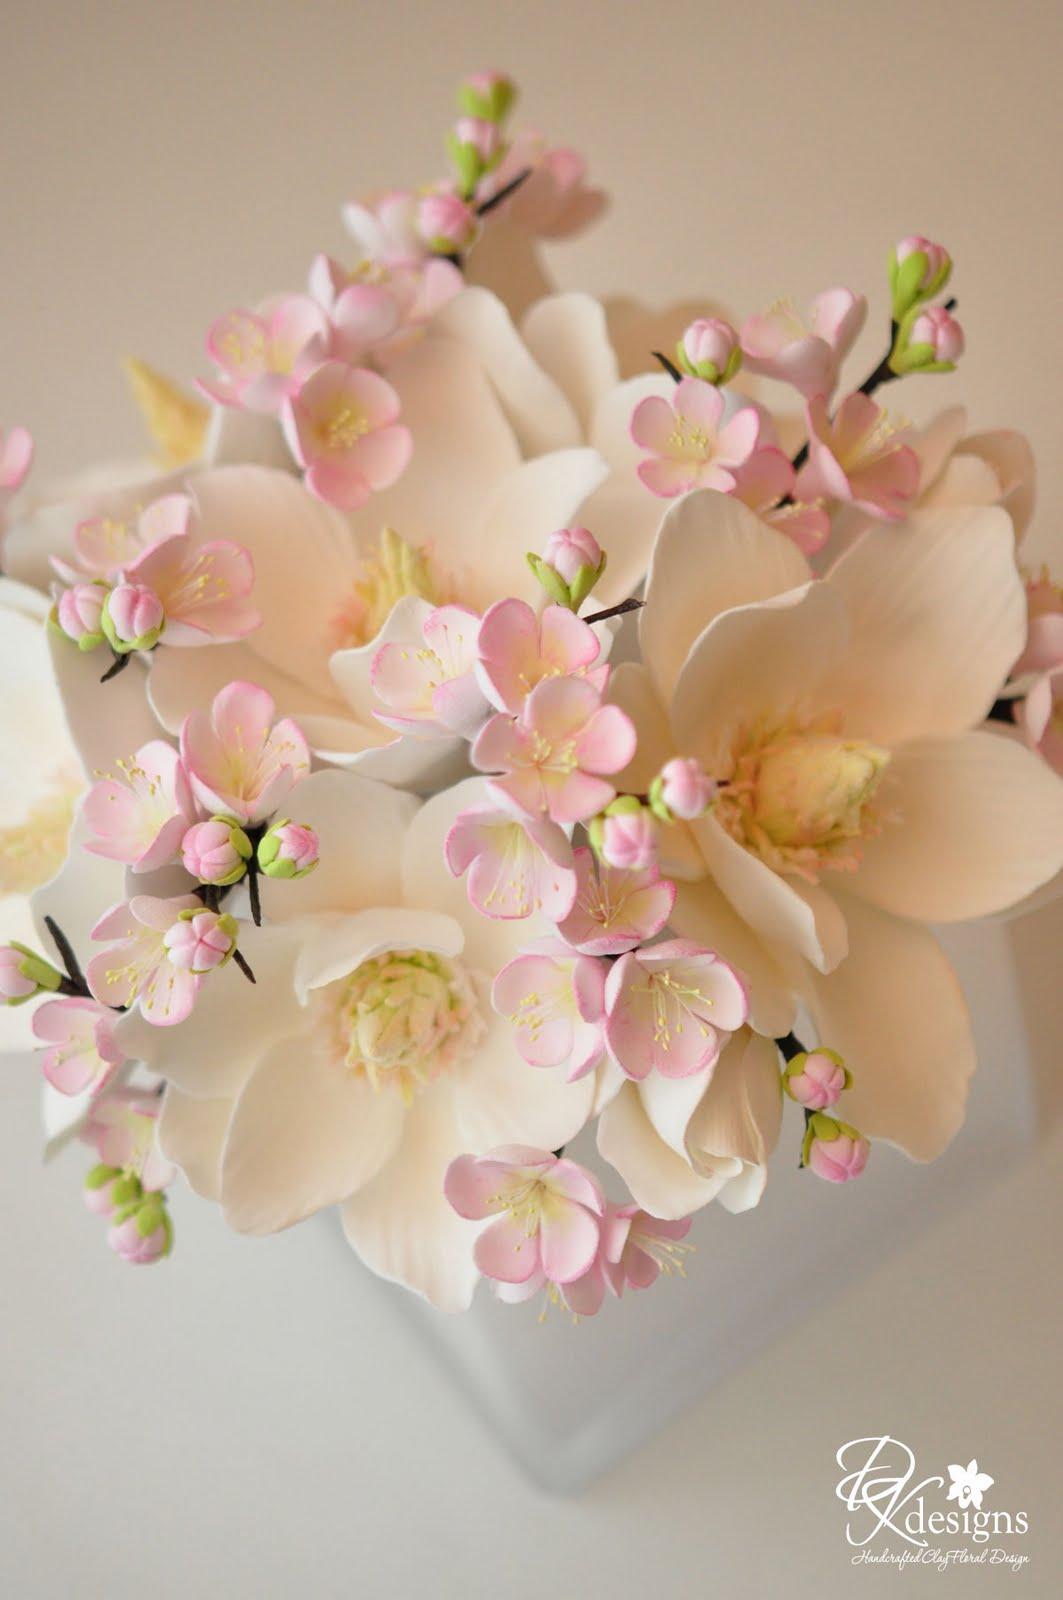 Custom Floral Arrangement = Magnolias and Plum Blossoms - DK Designs